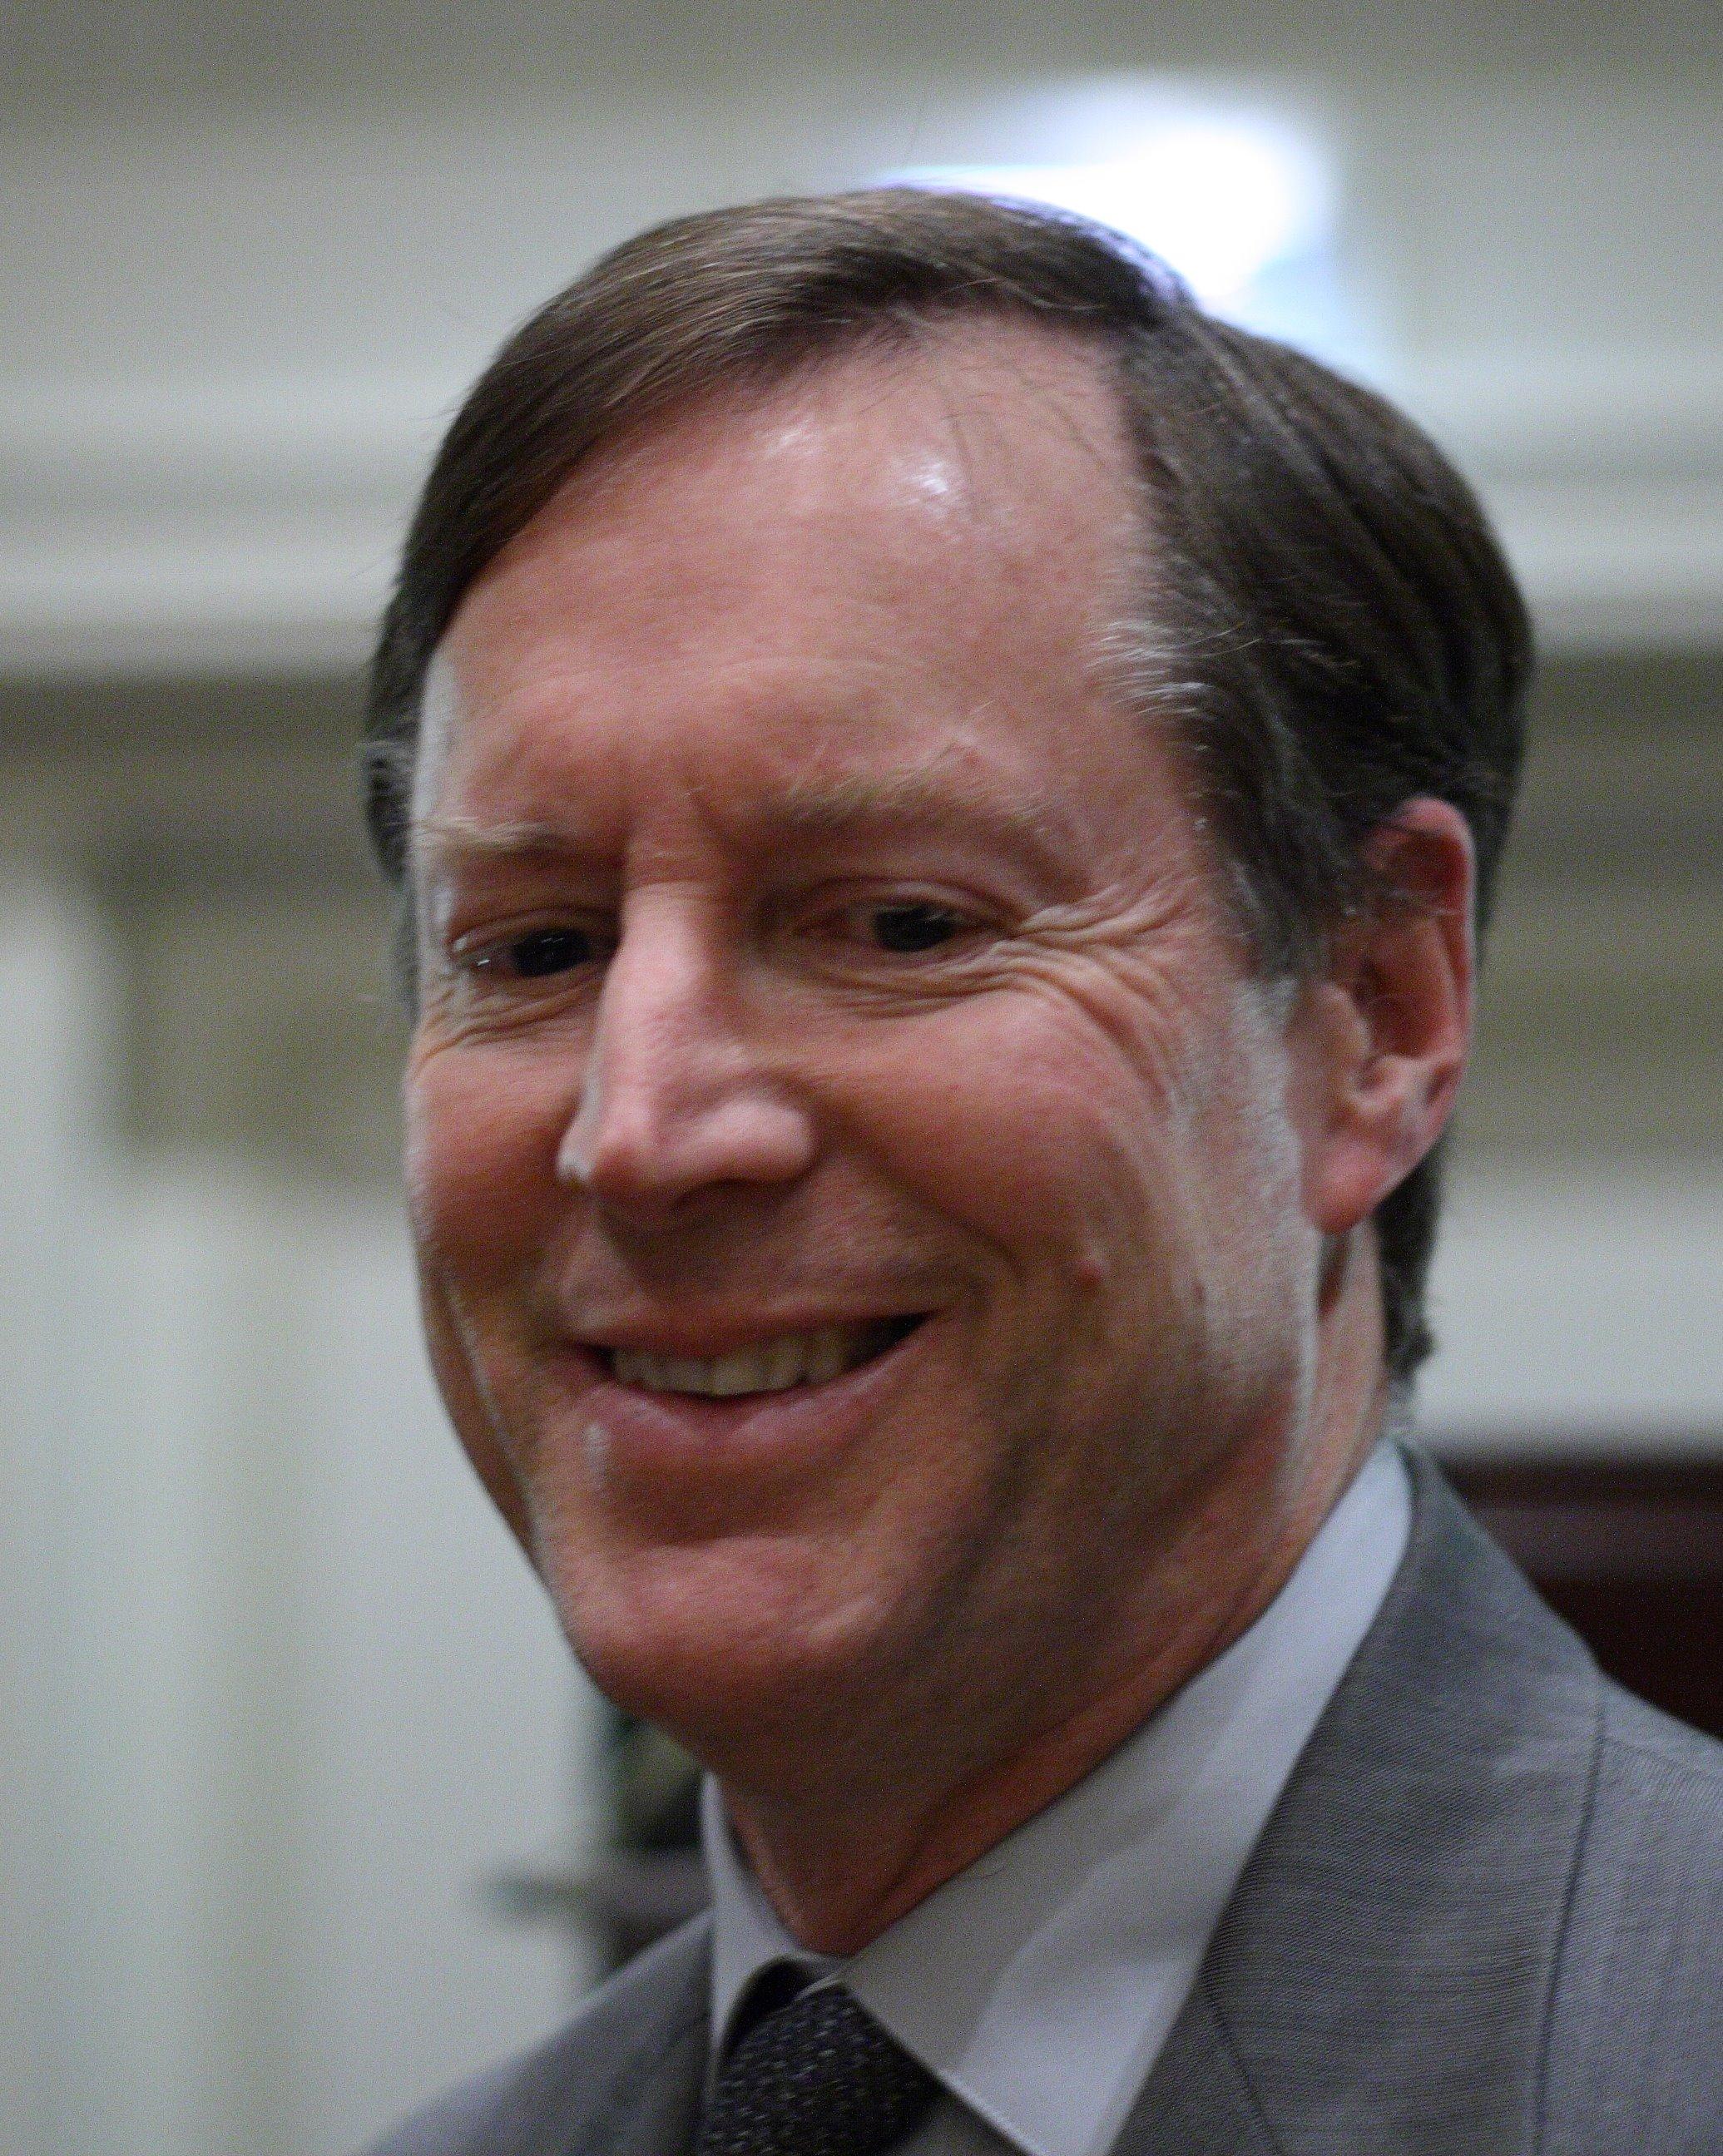 Theodore M. Porter